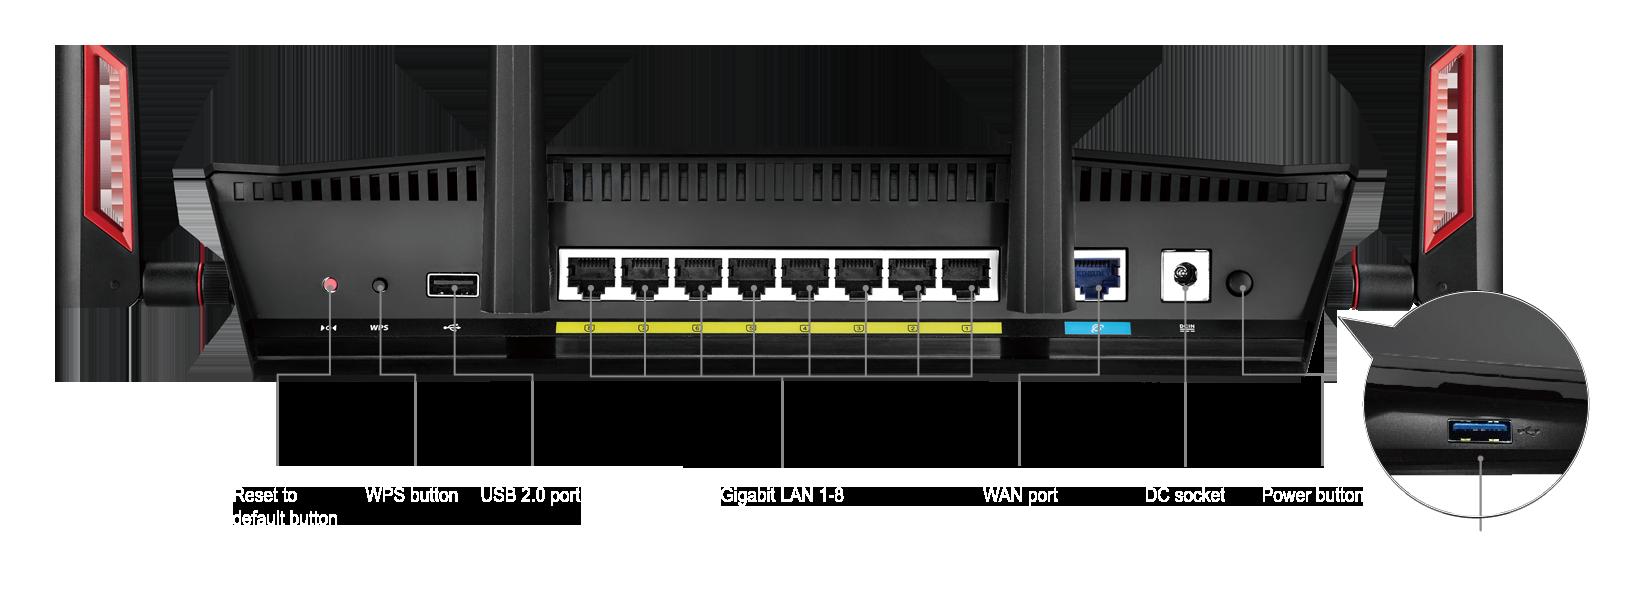 Rt Ac88u Networking Asus Usa